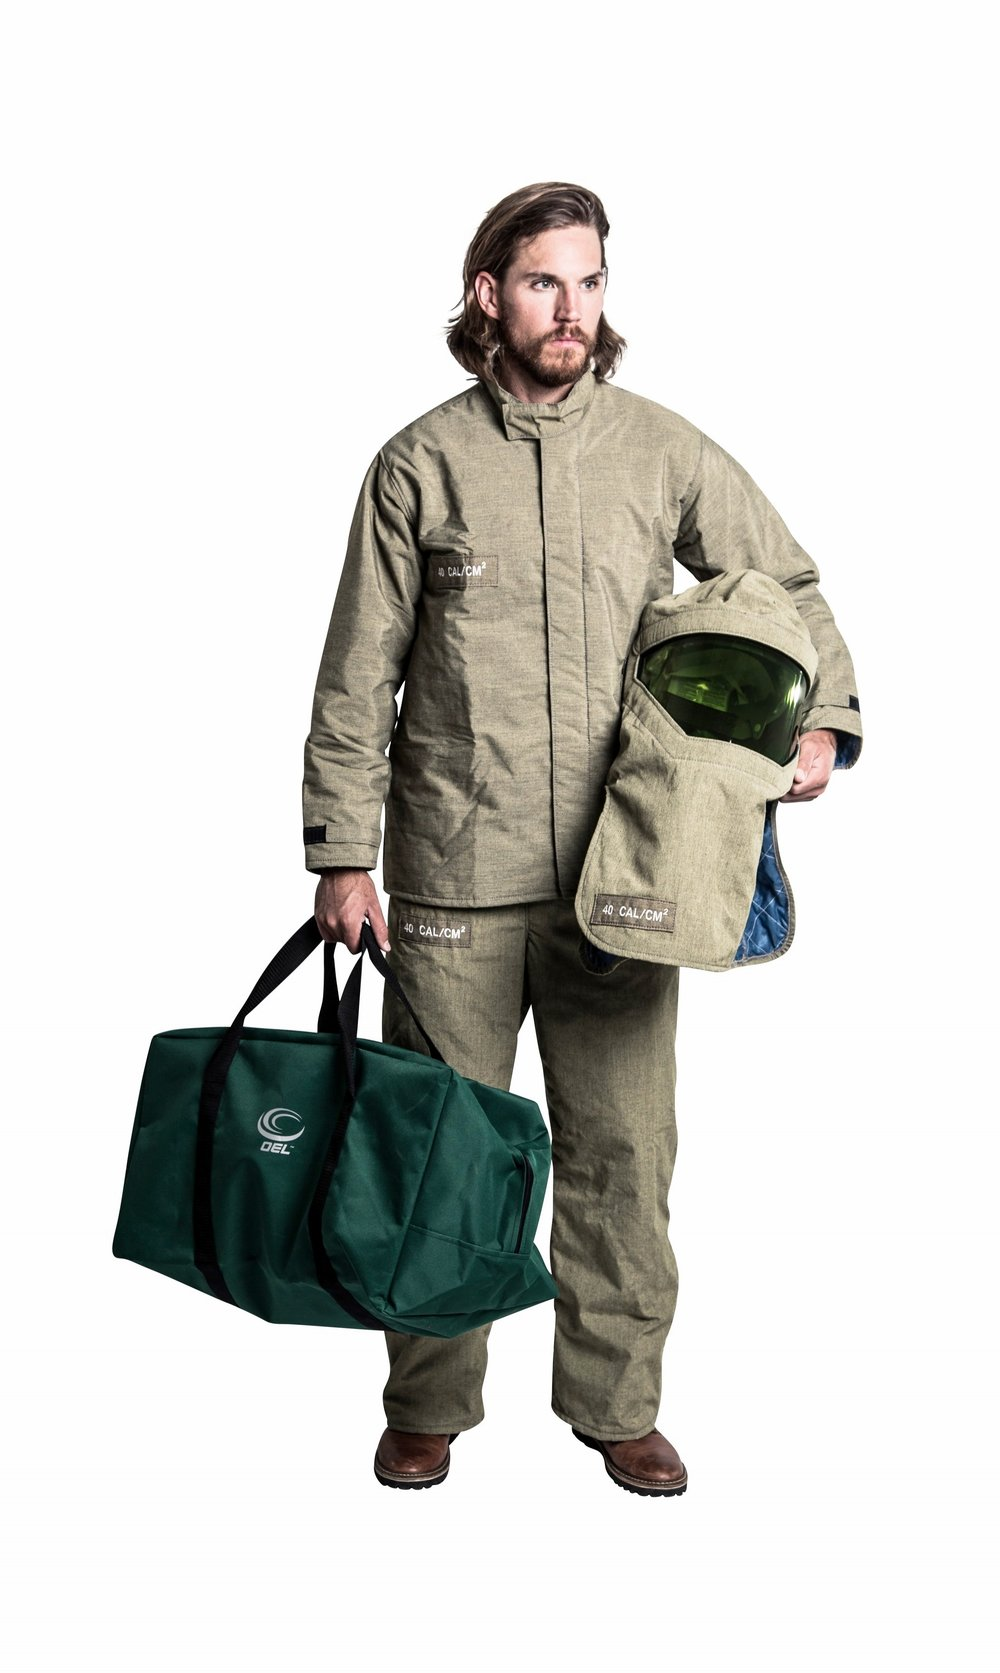 40Cal Jacket & Bib Premium Kit with Switchgear Hood